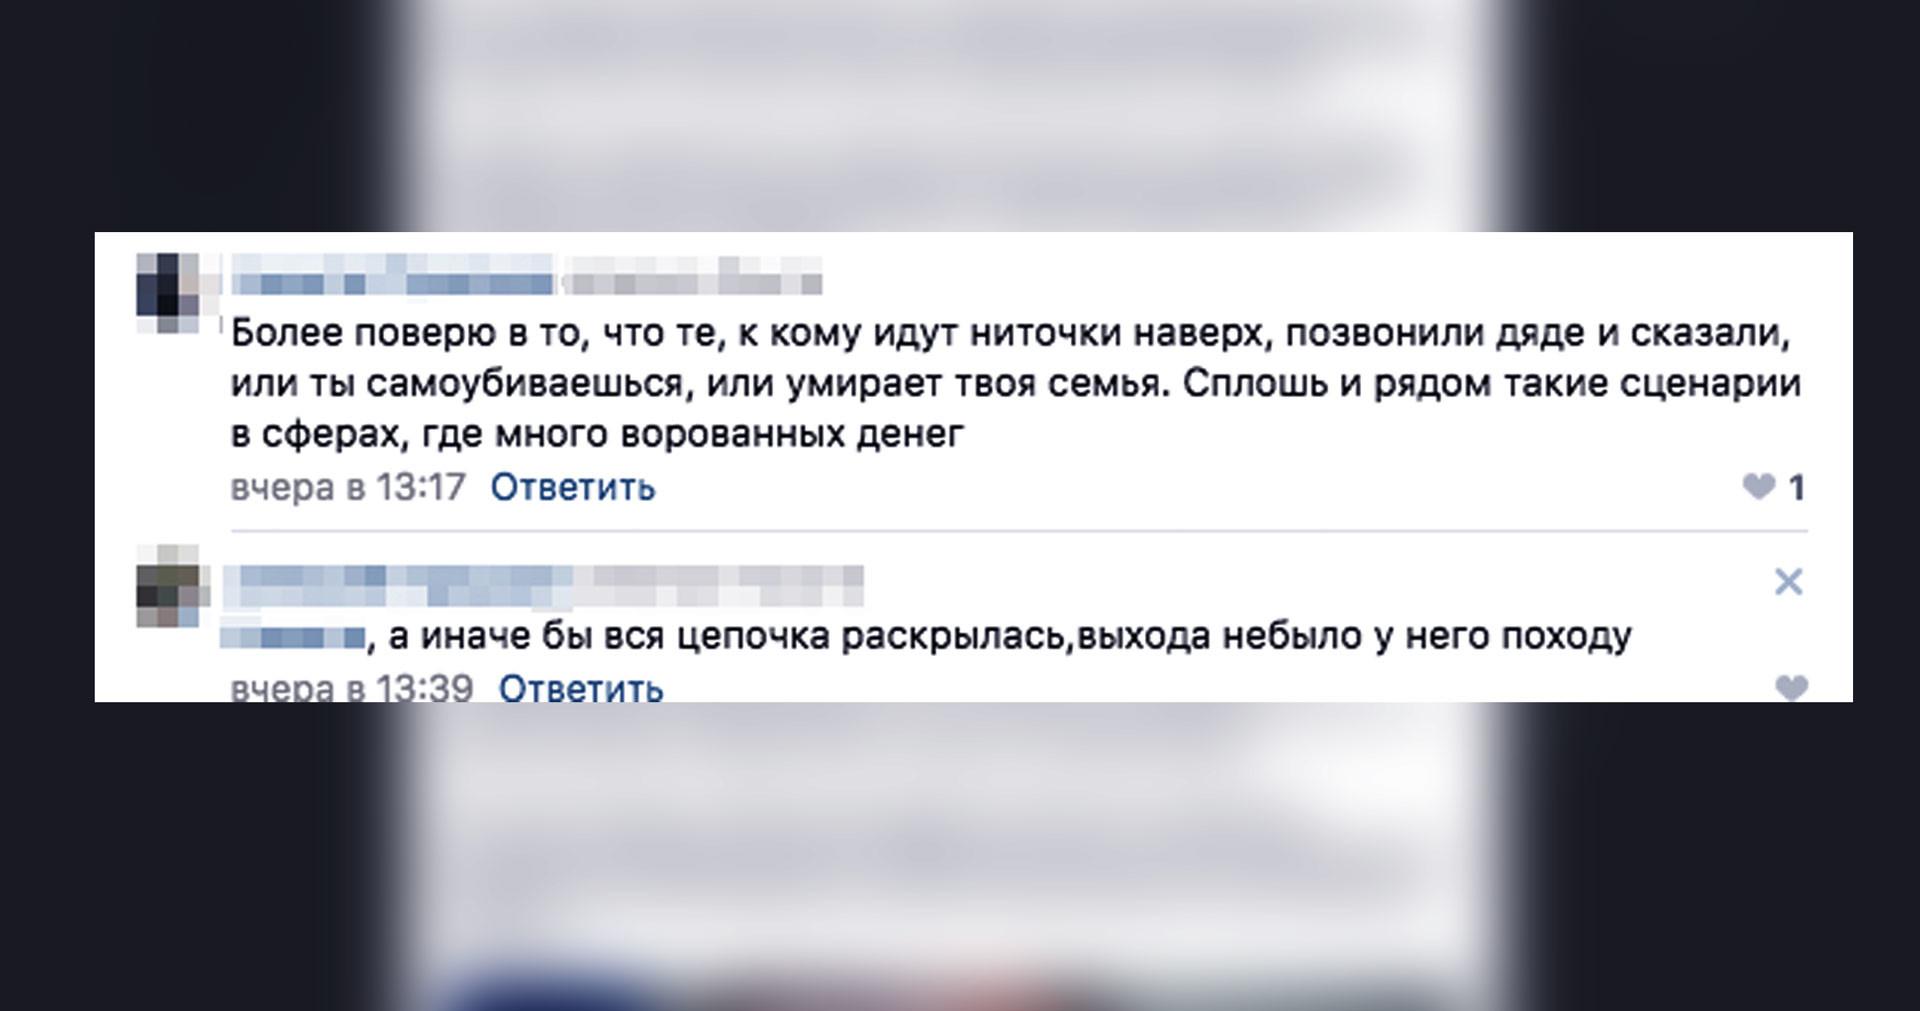 © VK / Мой Тамбов